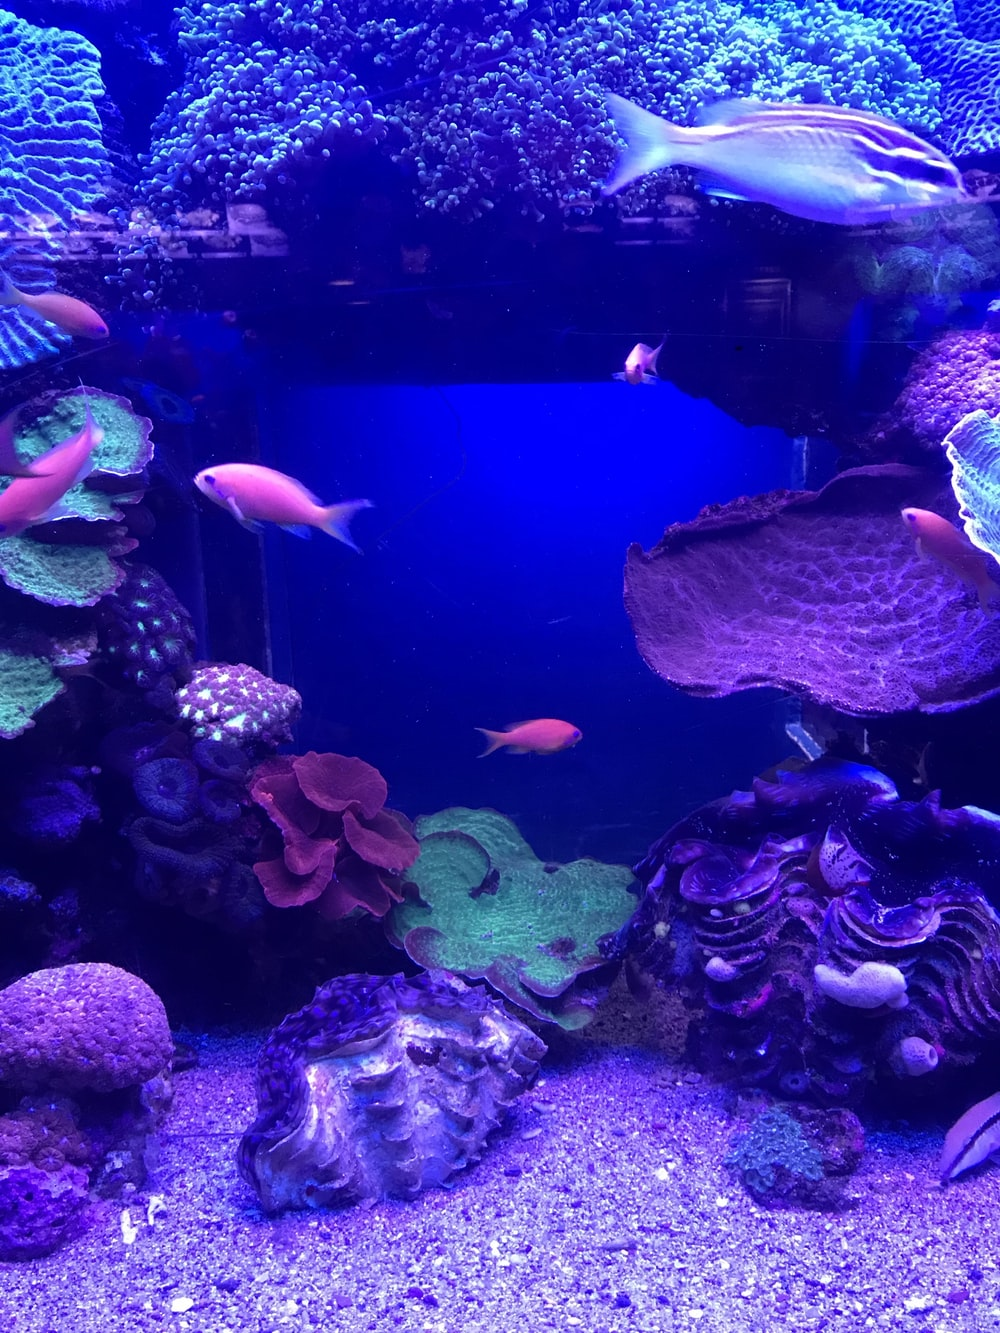 school of fish underwater photography